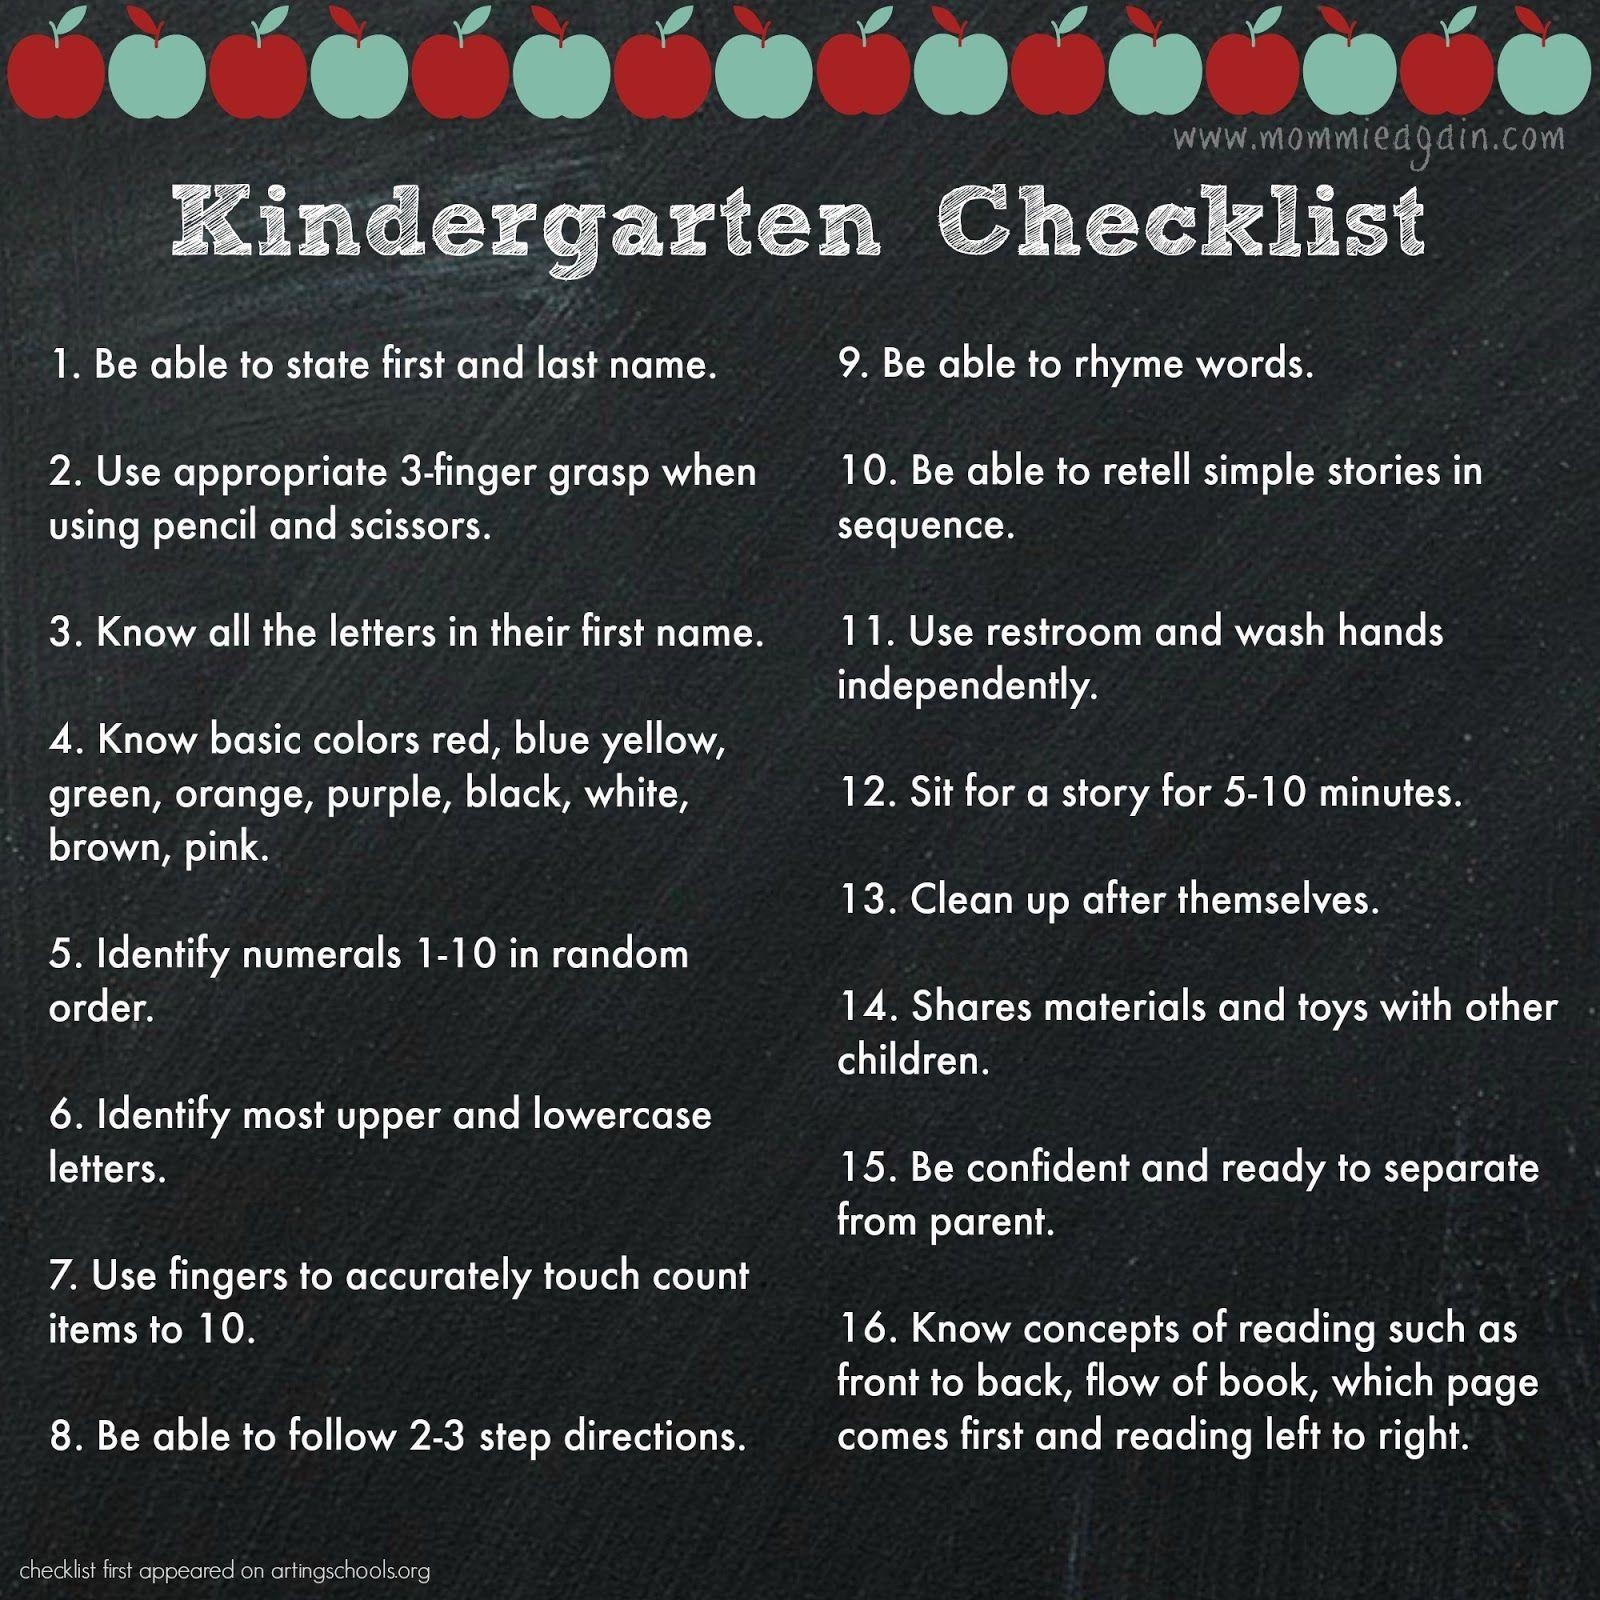 Worksheet Preparing Your Child For Kindergarten 1000 images about preschool assessments on pinterest assessment portfolio binder and assessment